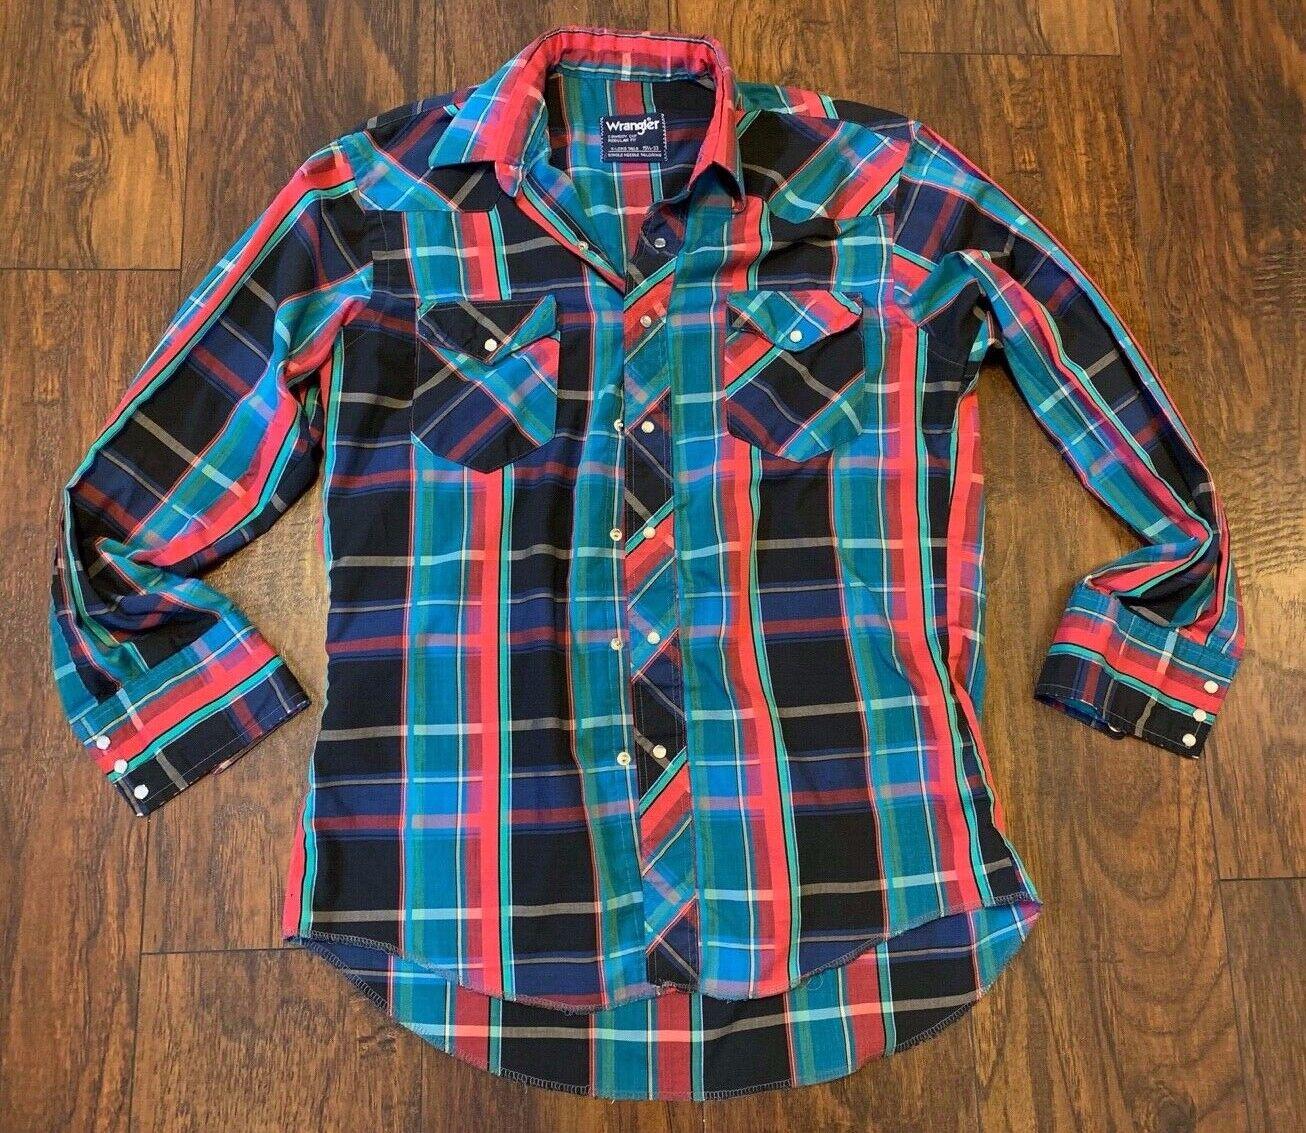 VTG Wrangler Men's Plaid Long Sleeve Button Up Shirt 15.5-33 Small Cowboy Cut